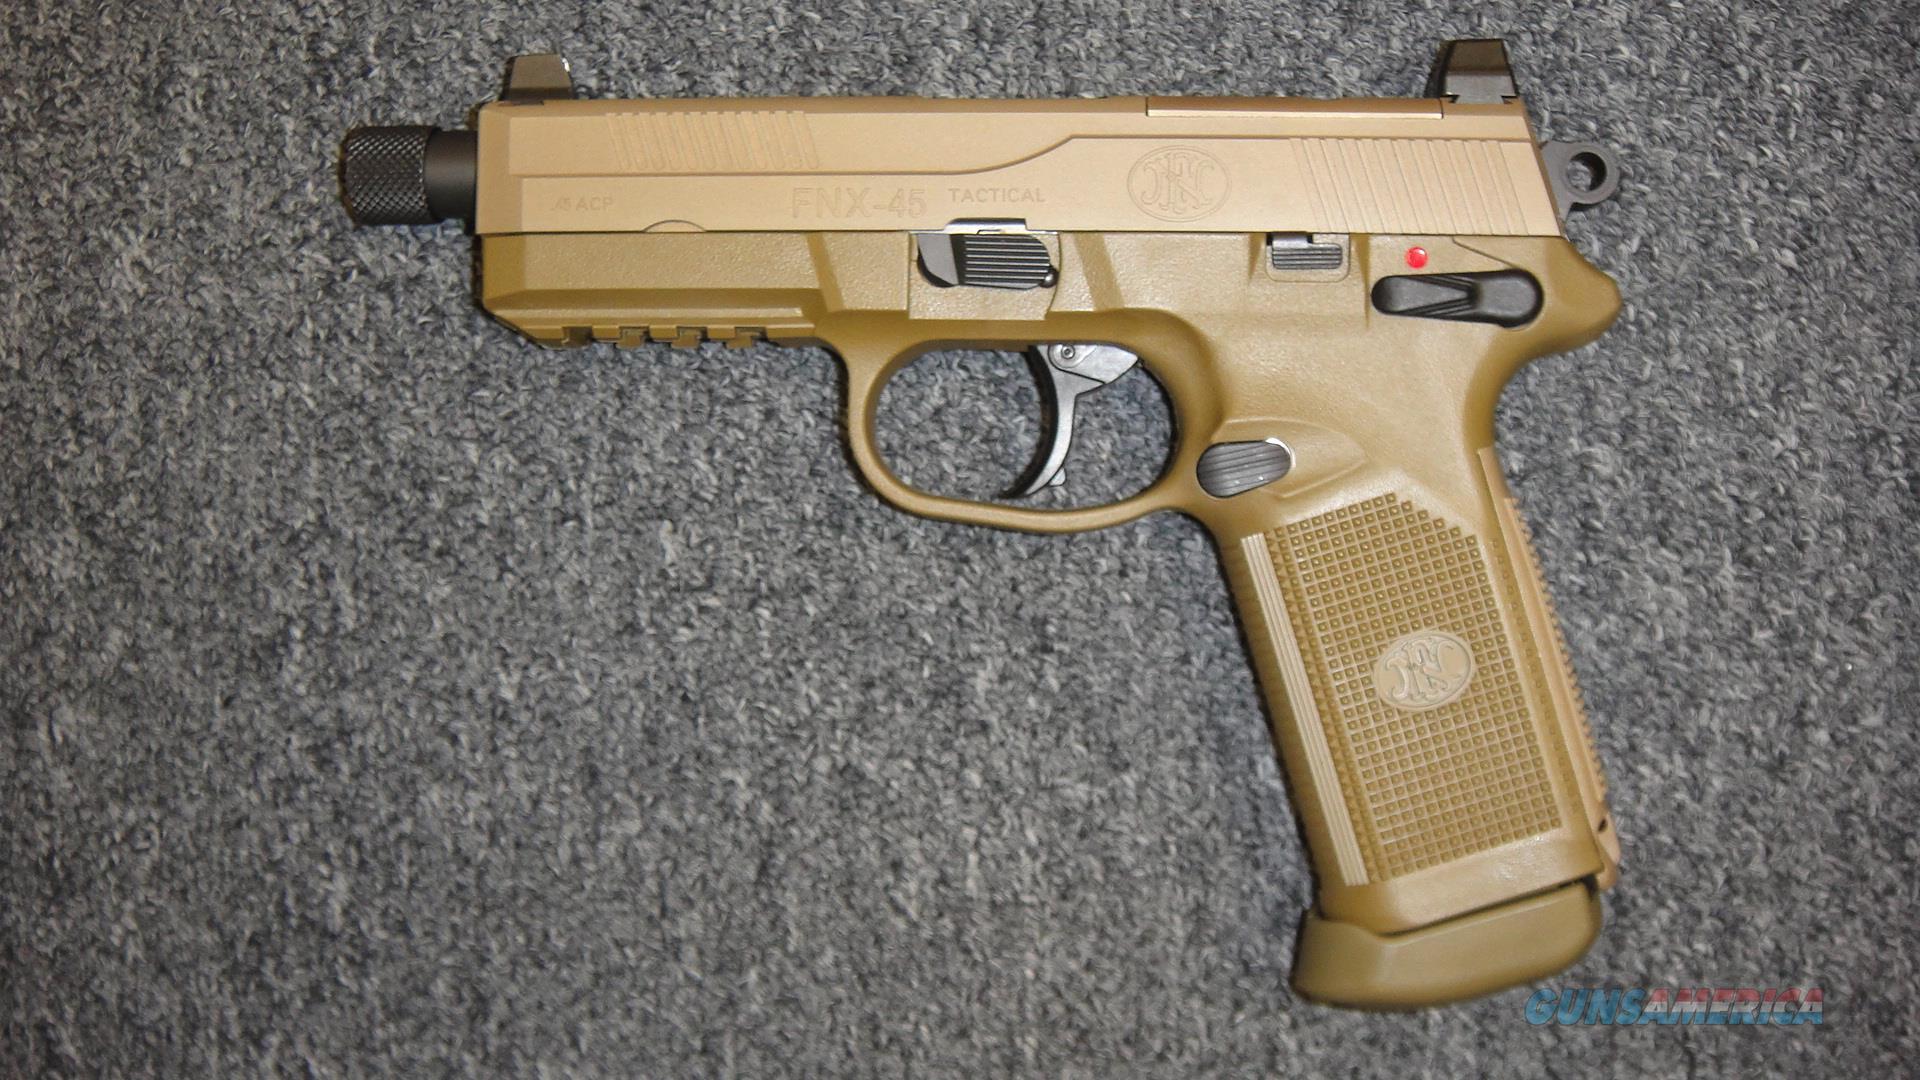 FNH FNX 45 Tactical FDE  Guns > Pistols > FNH - Fabrique Nationale (FN) Pistols > FNX